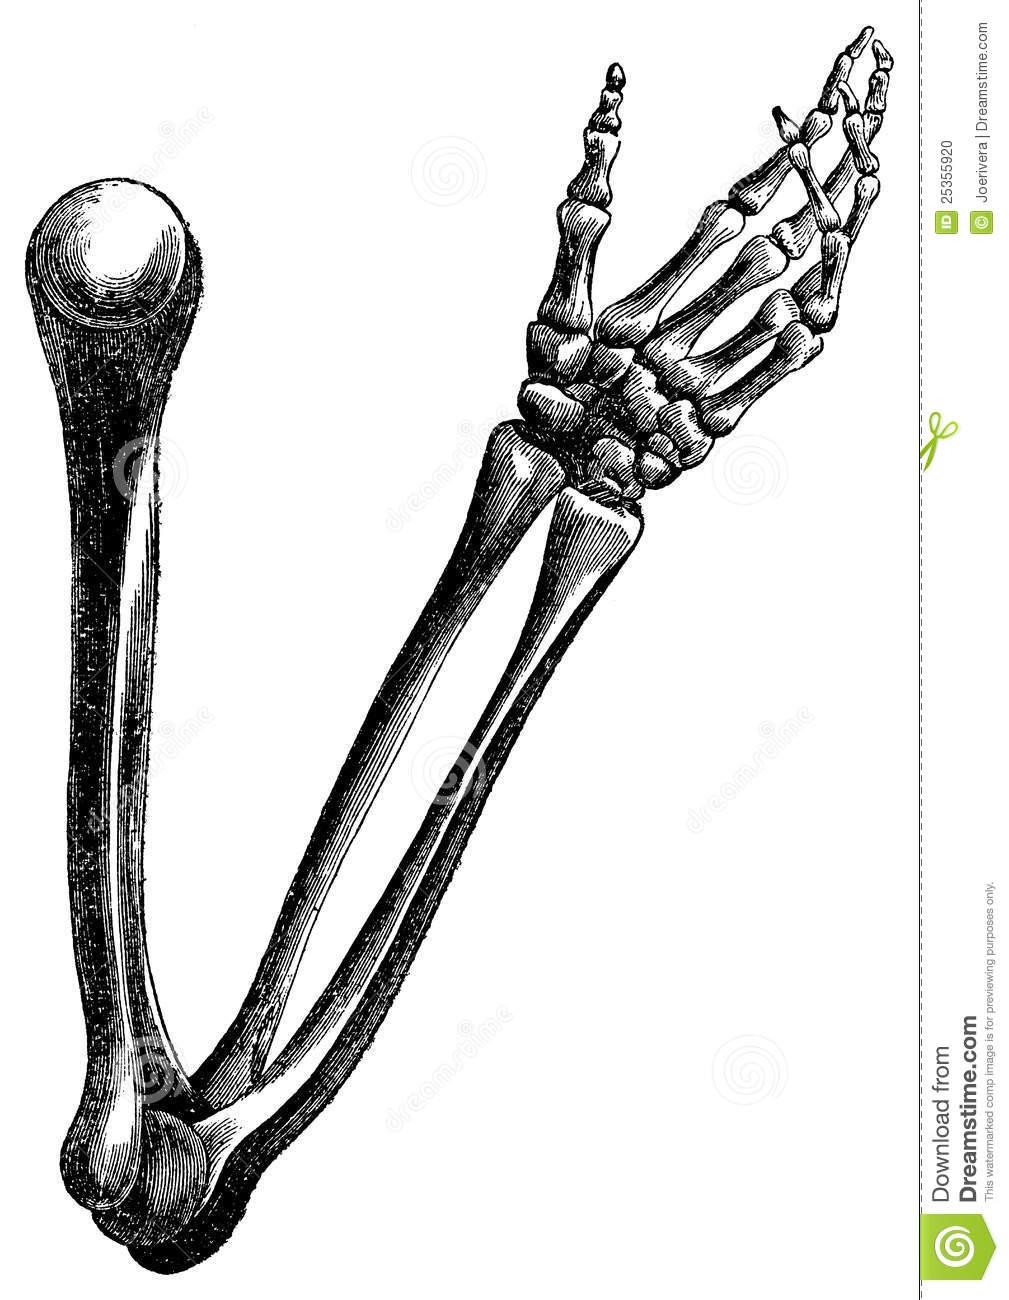 Drawn sleleton arm Arm bones  25355920 engraving